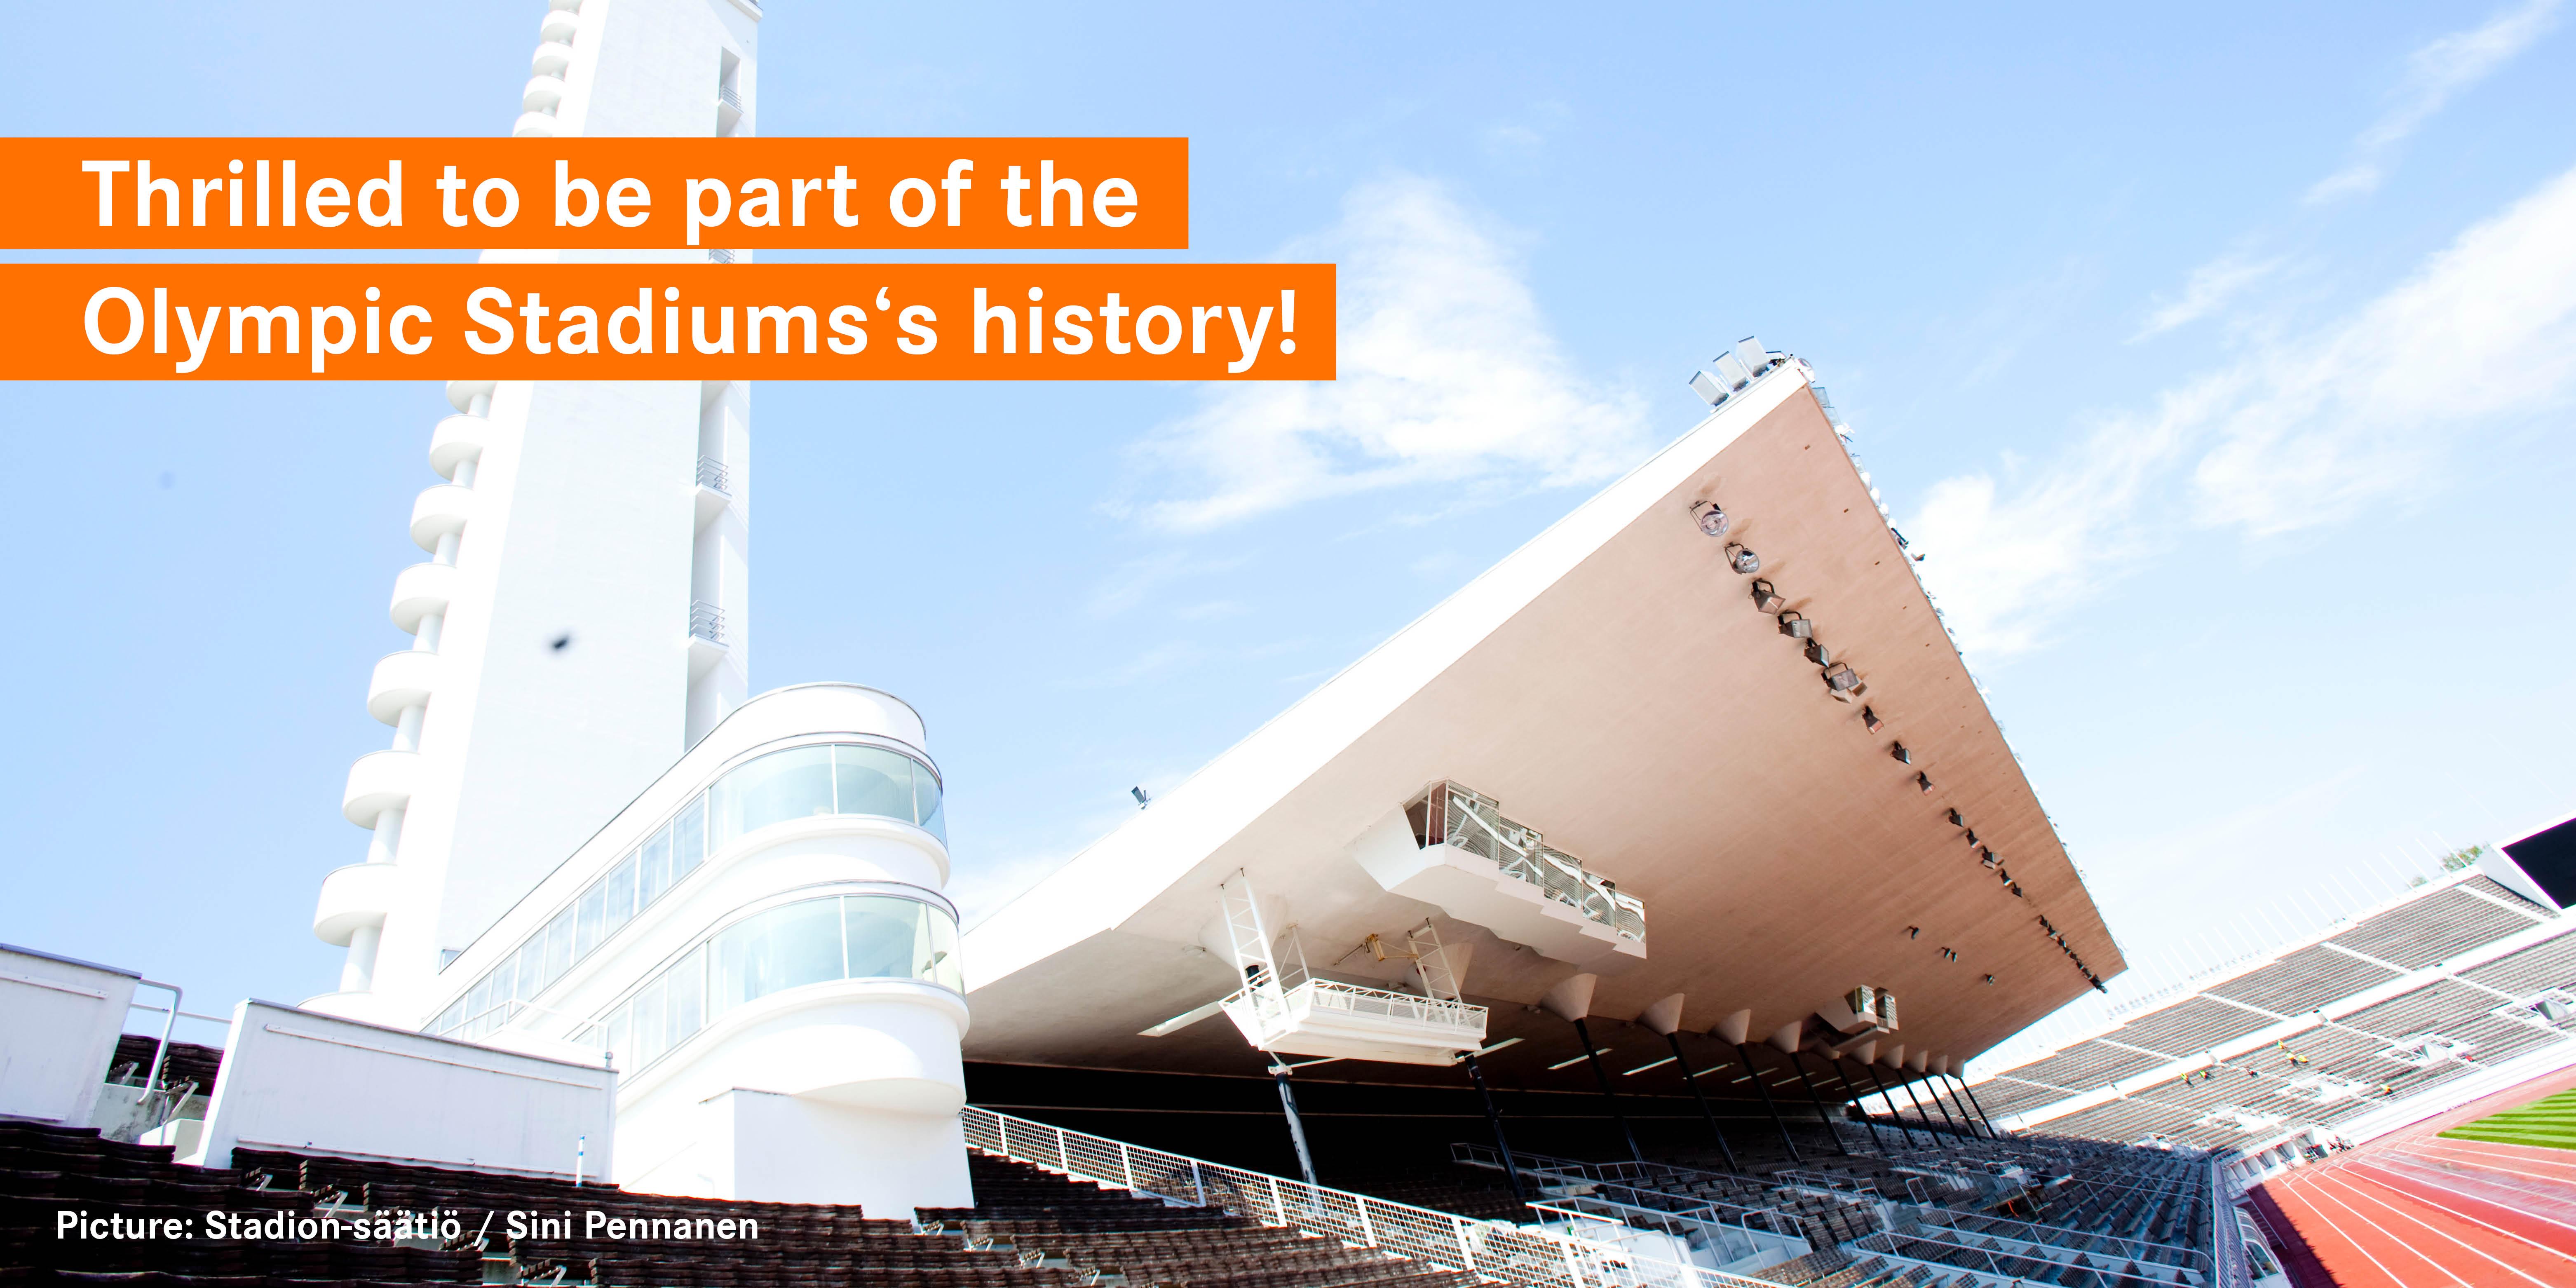 the-olympics-stadium-history-slider